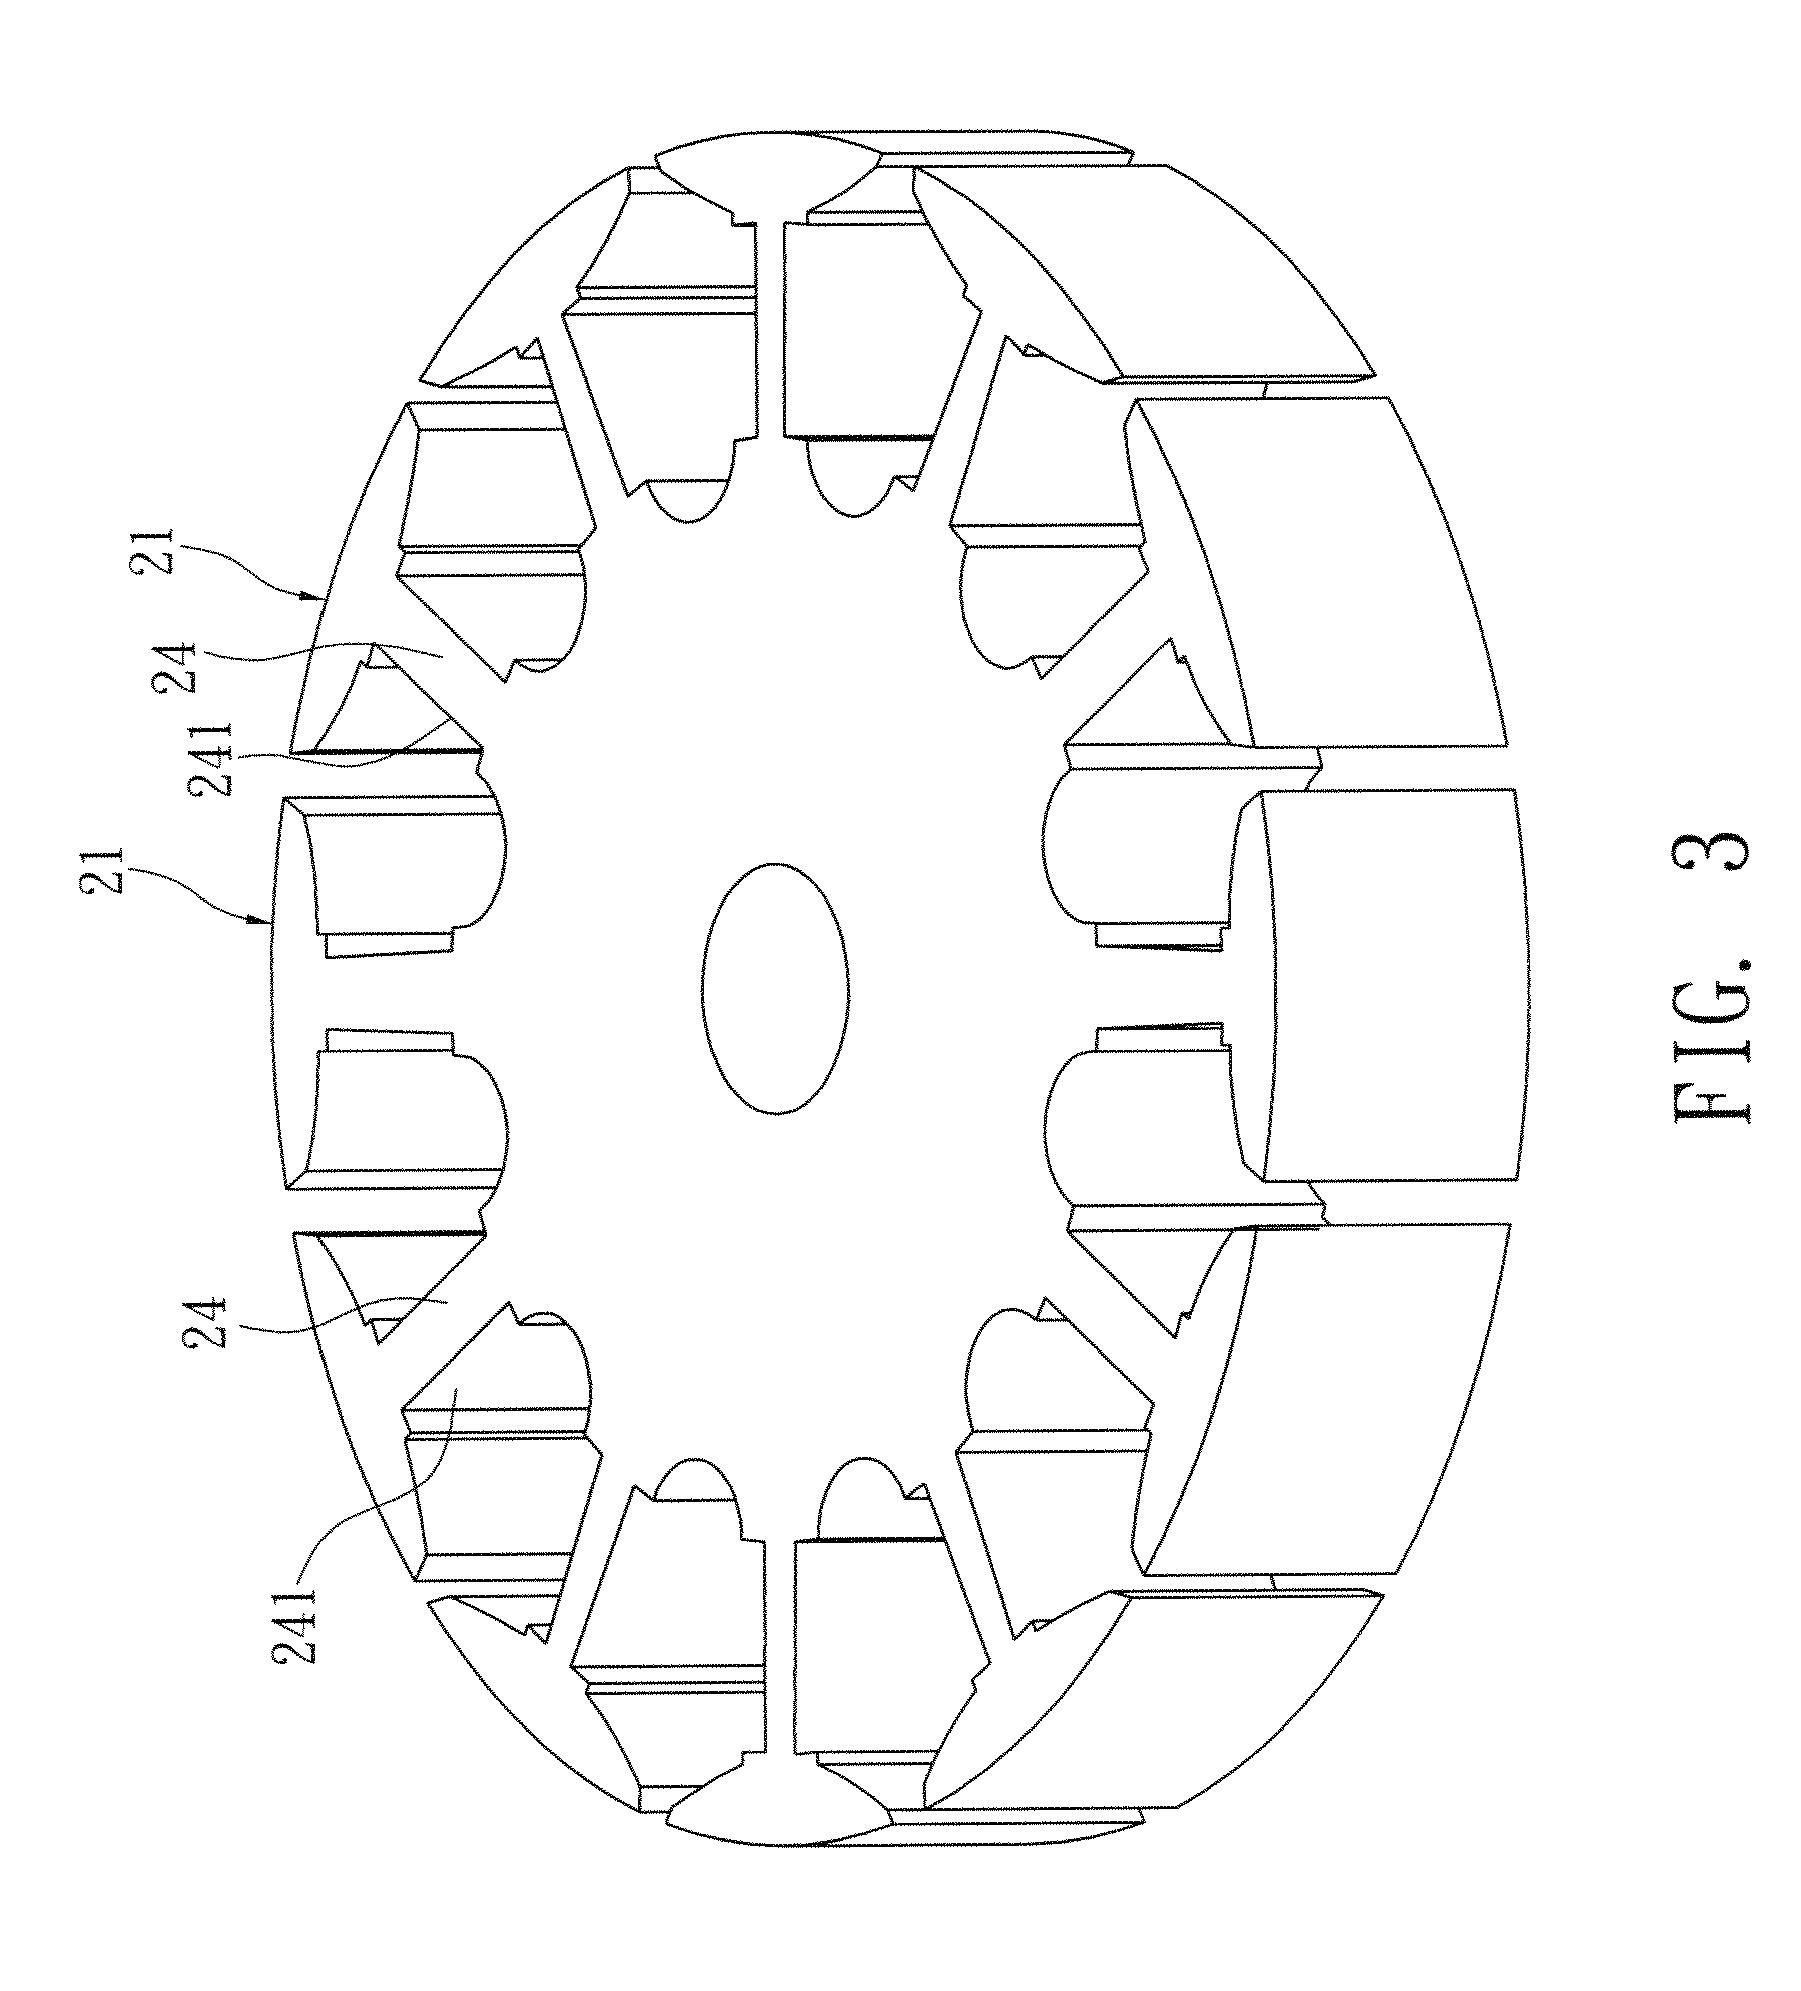 Secret Diagram: Topic Wiring diagram of ceiling fan